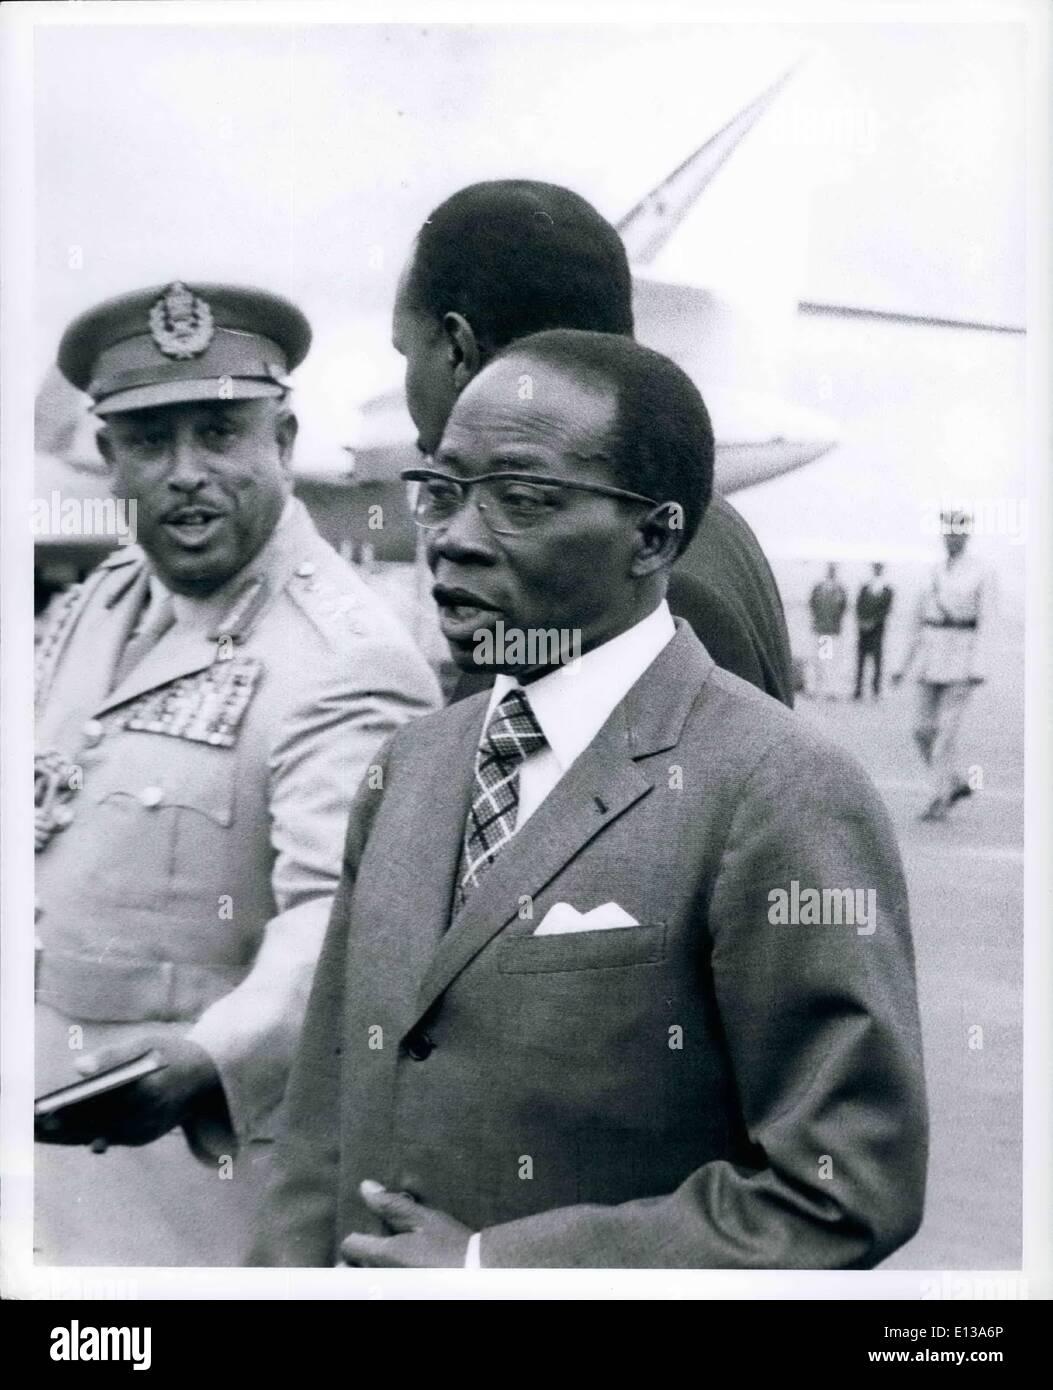 Feb. 29, 2012 - 10th OAV meeting Addis Abbaba, May 23, 1973 arrival of Severpol President Leopold Senghor. C - Stock Image